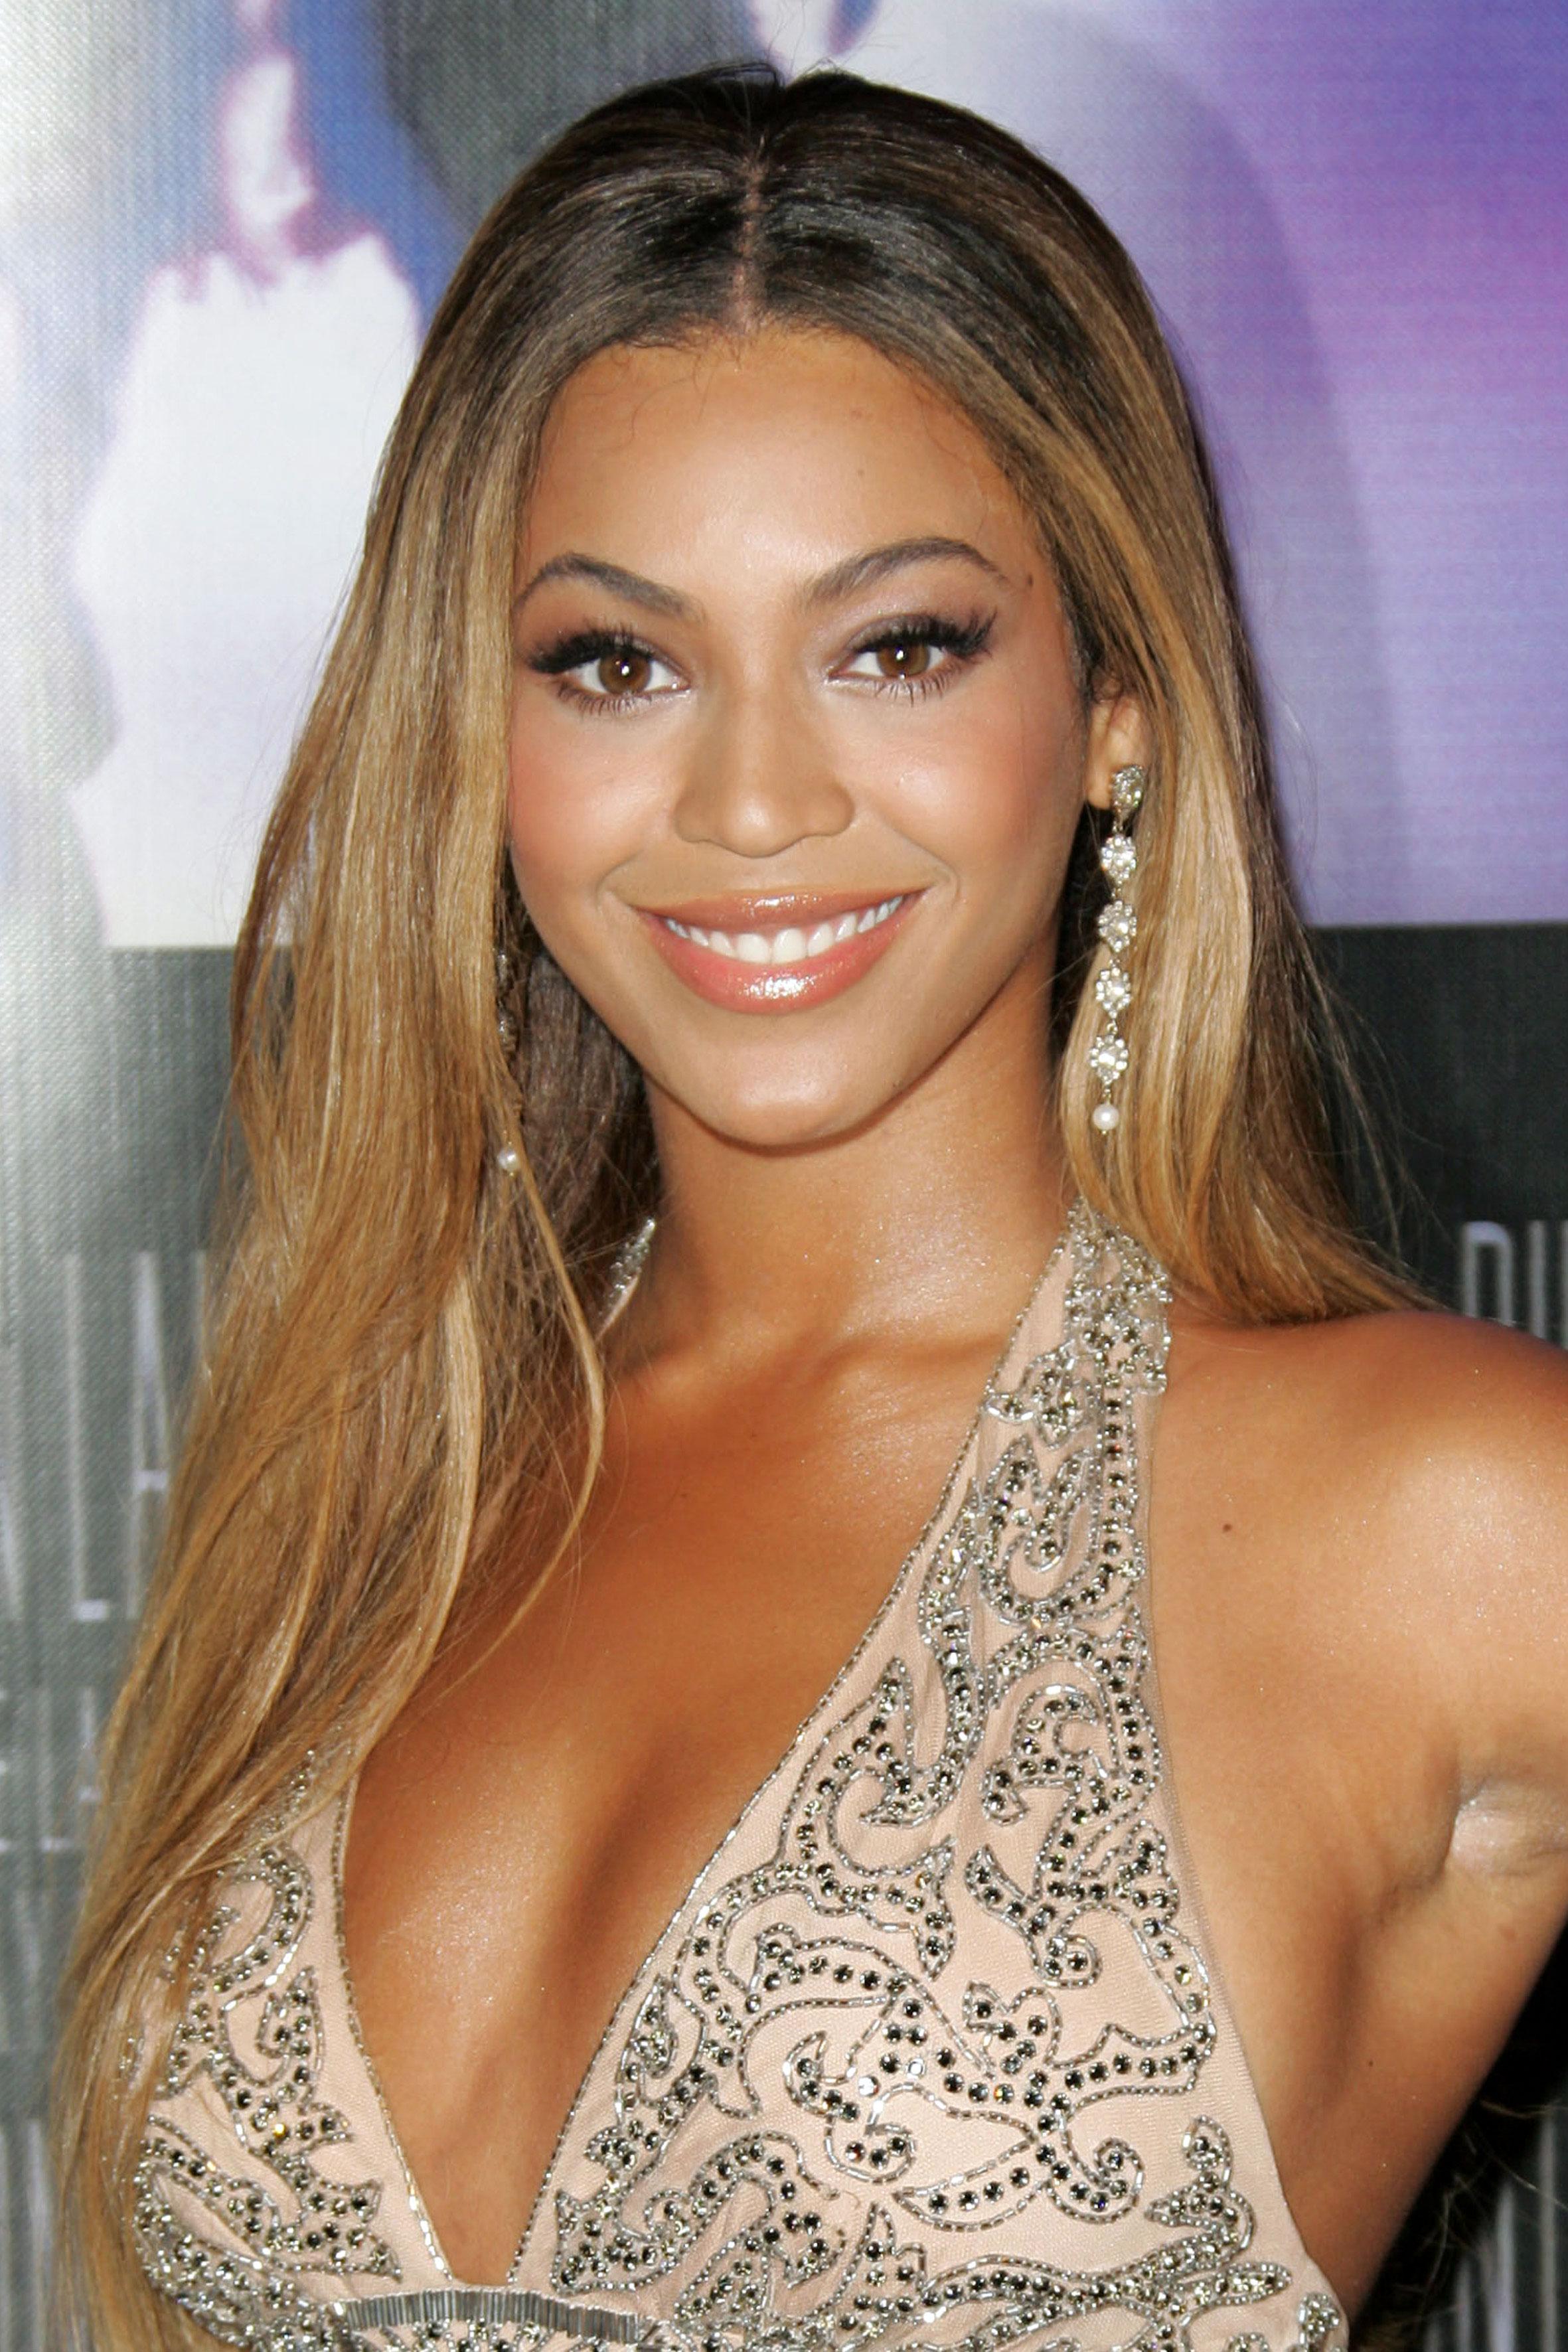 Stupendous 40 Beyonce Hairstyles Beyonce39S Real Hair Long Hair And Short Short Hairstyles Gunalazisus